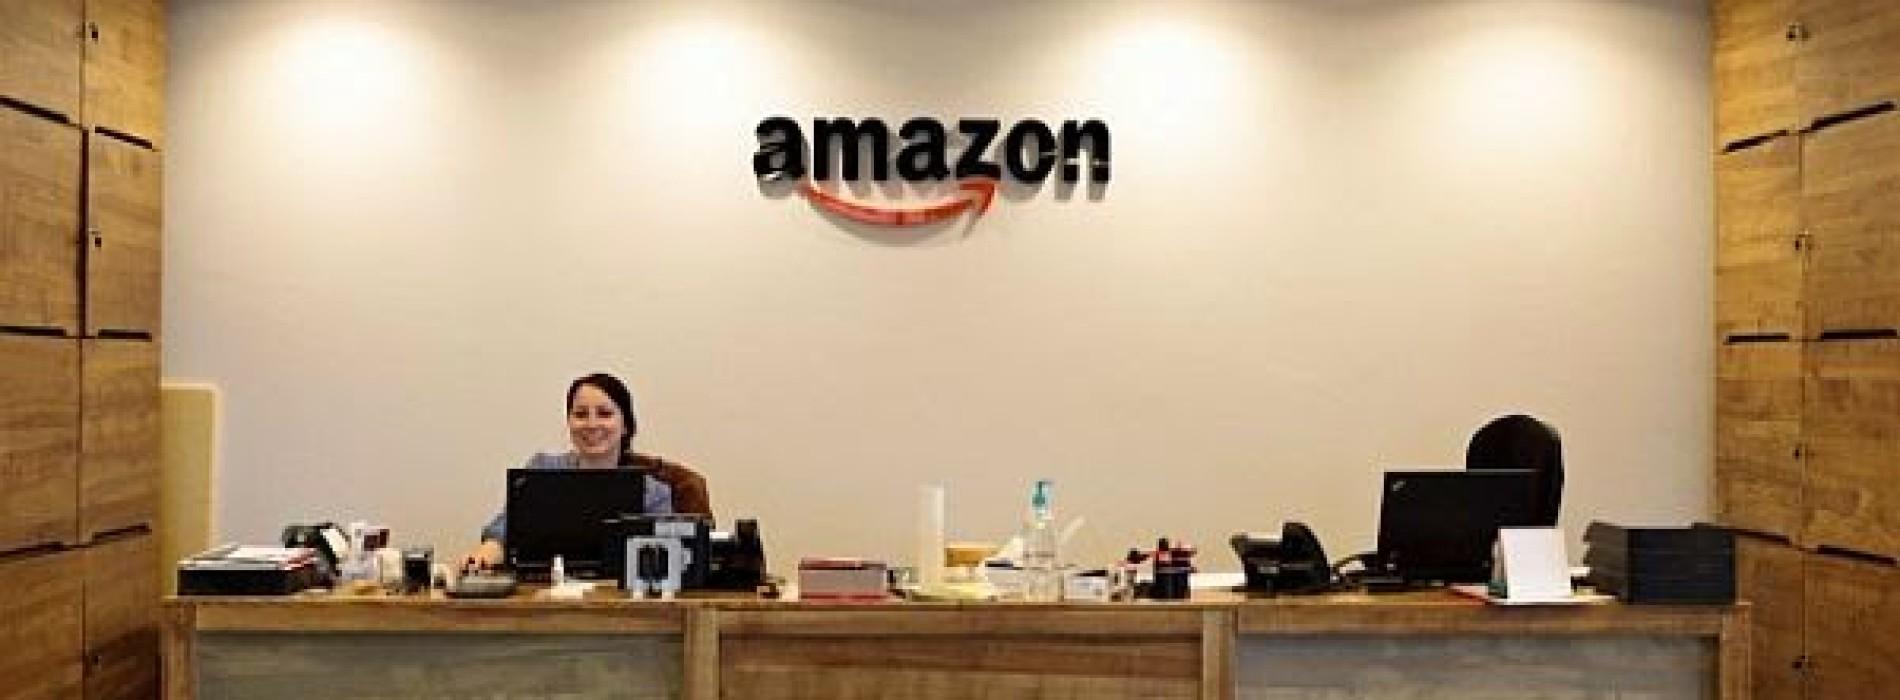 Amazon apre in Sud Africa